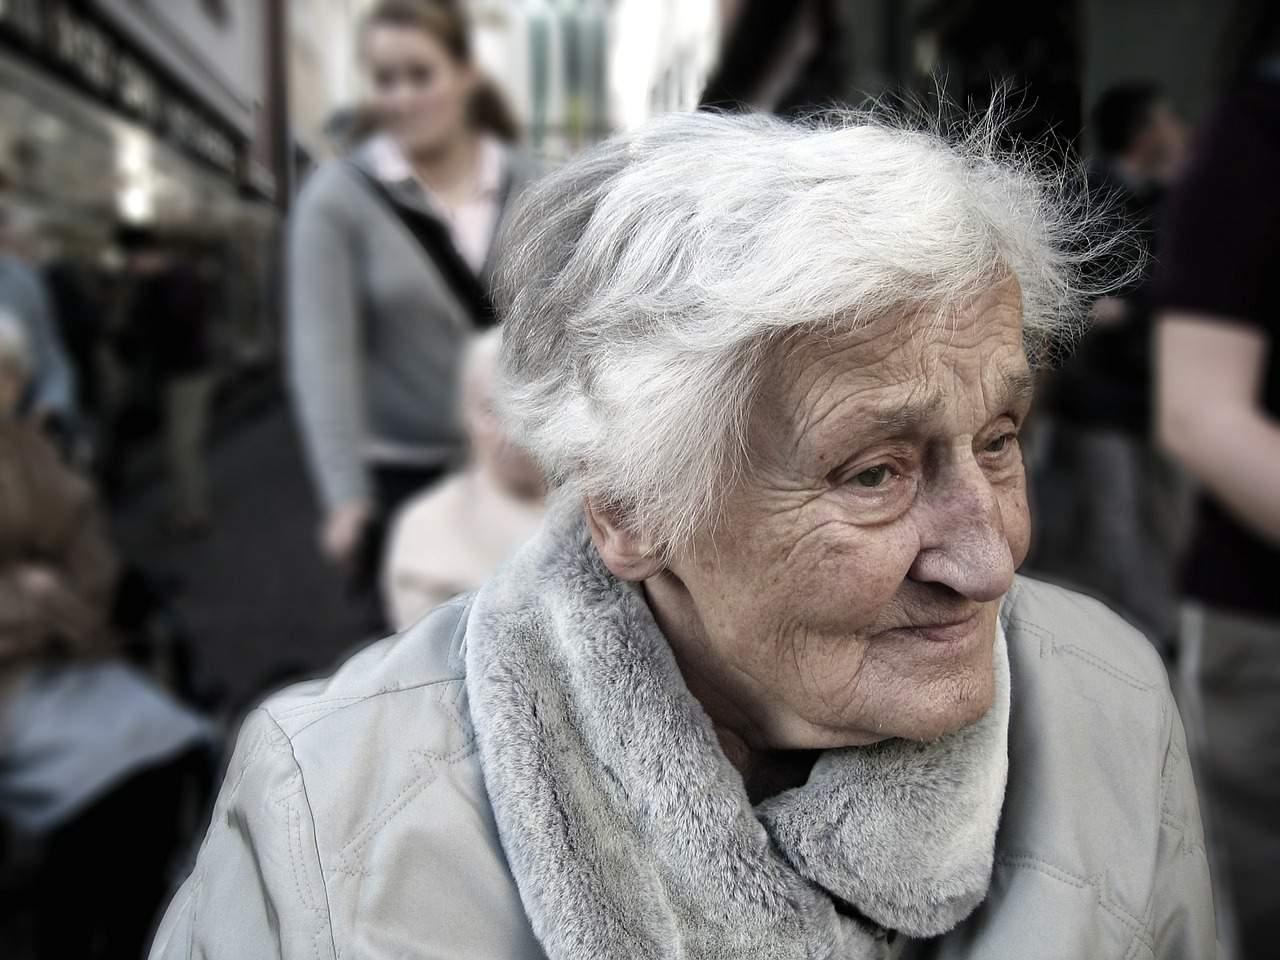 Elderly Old Lady